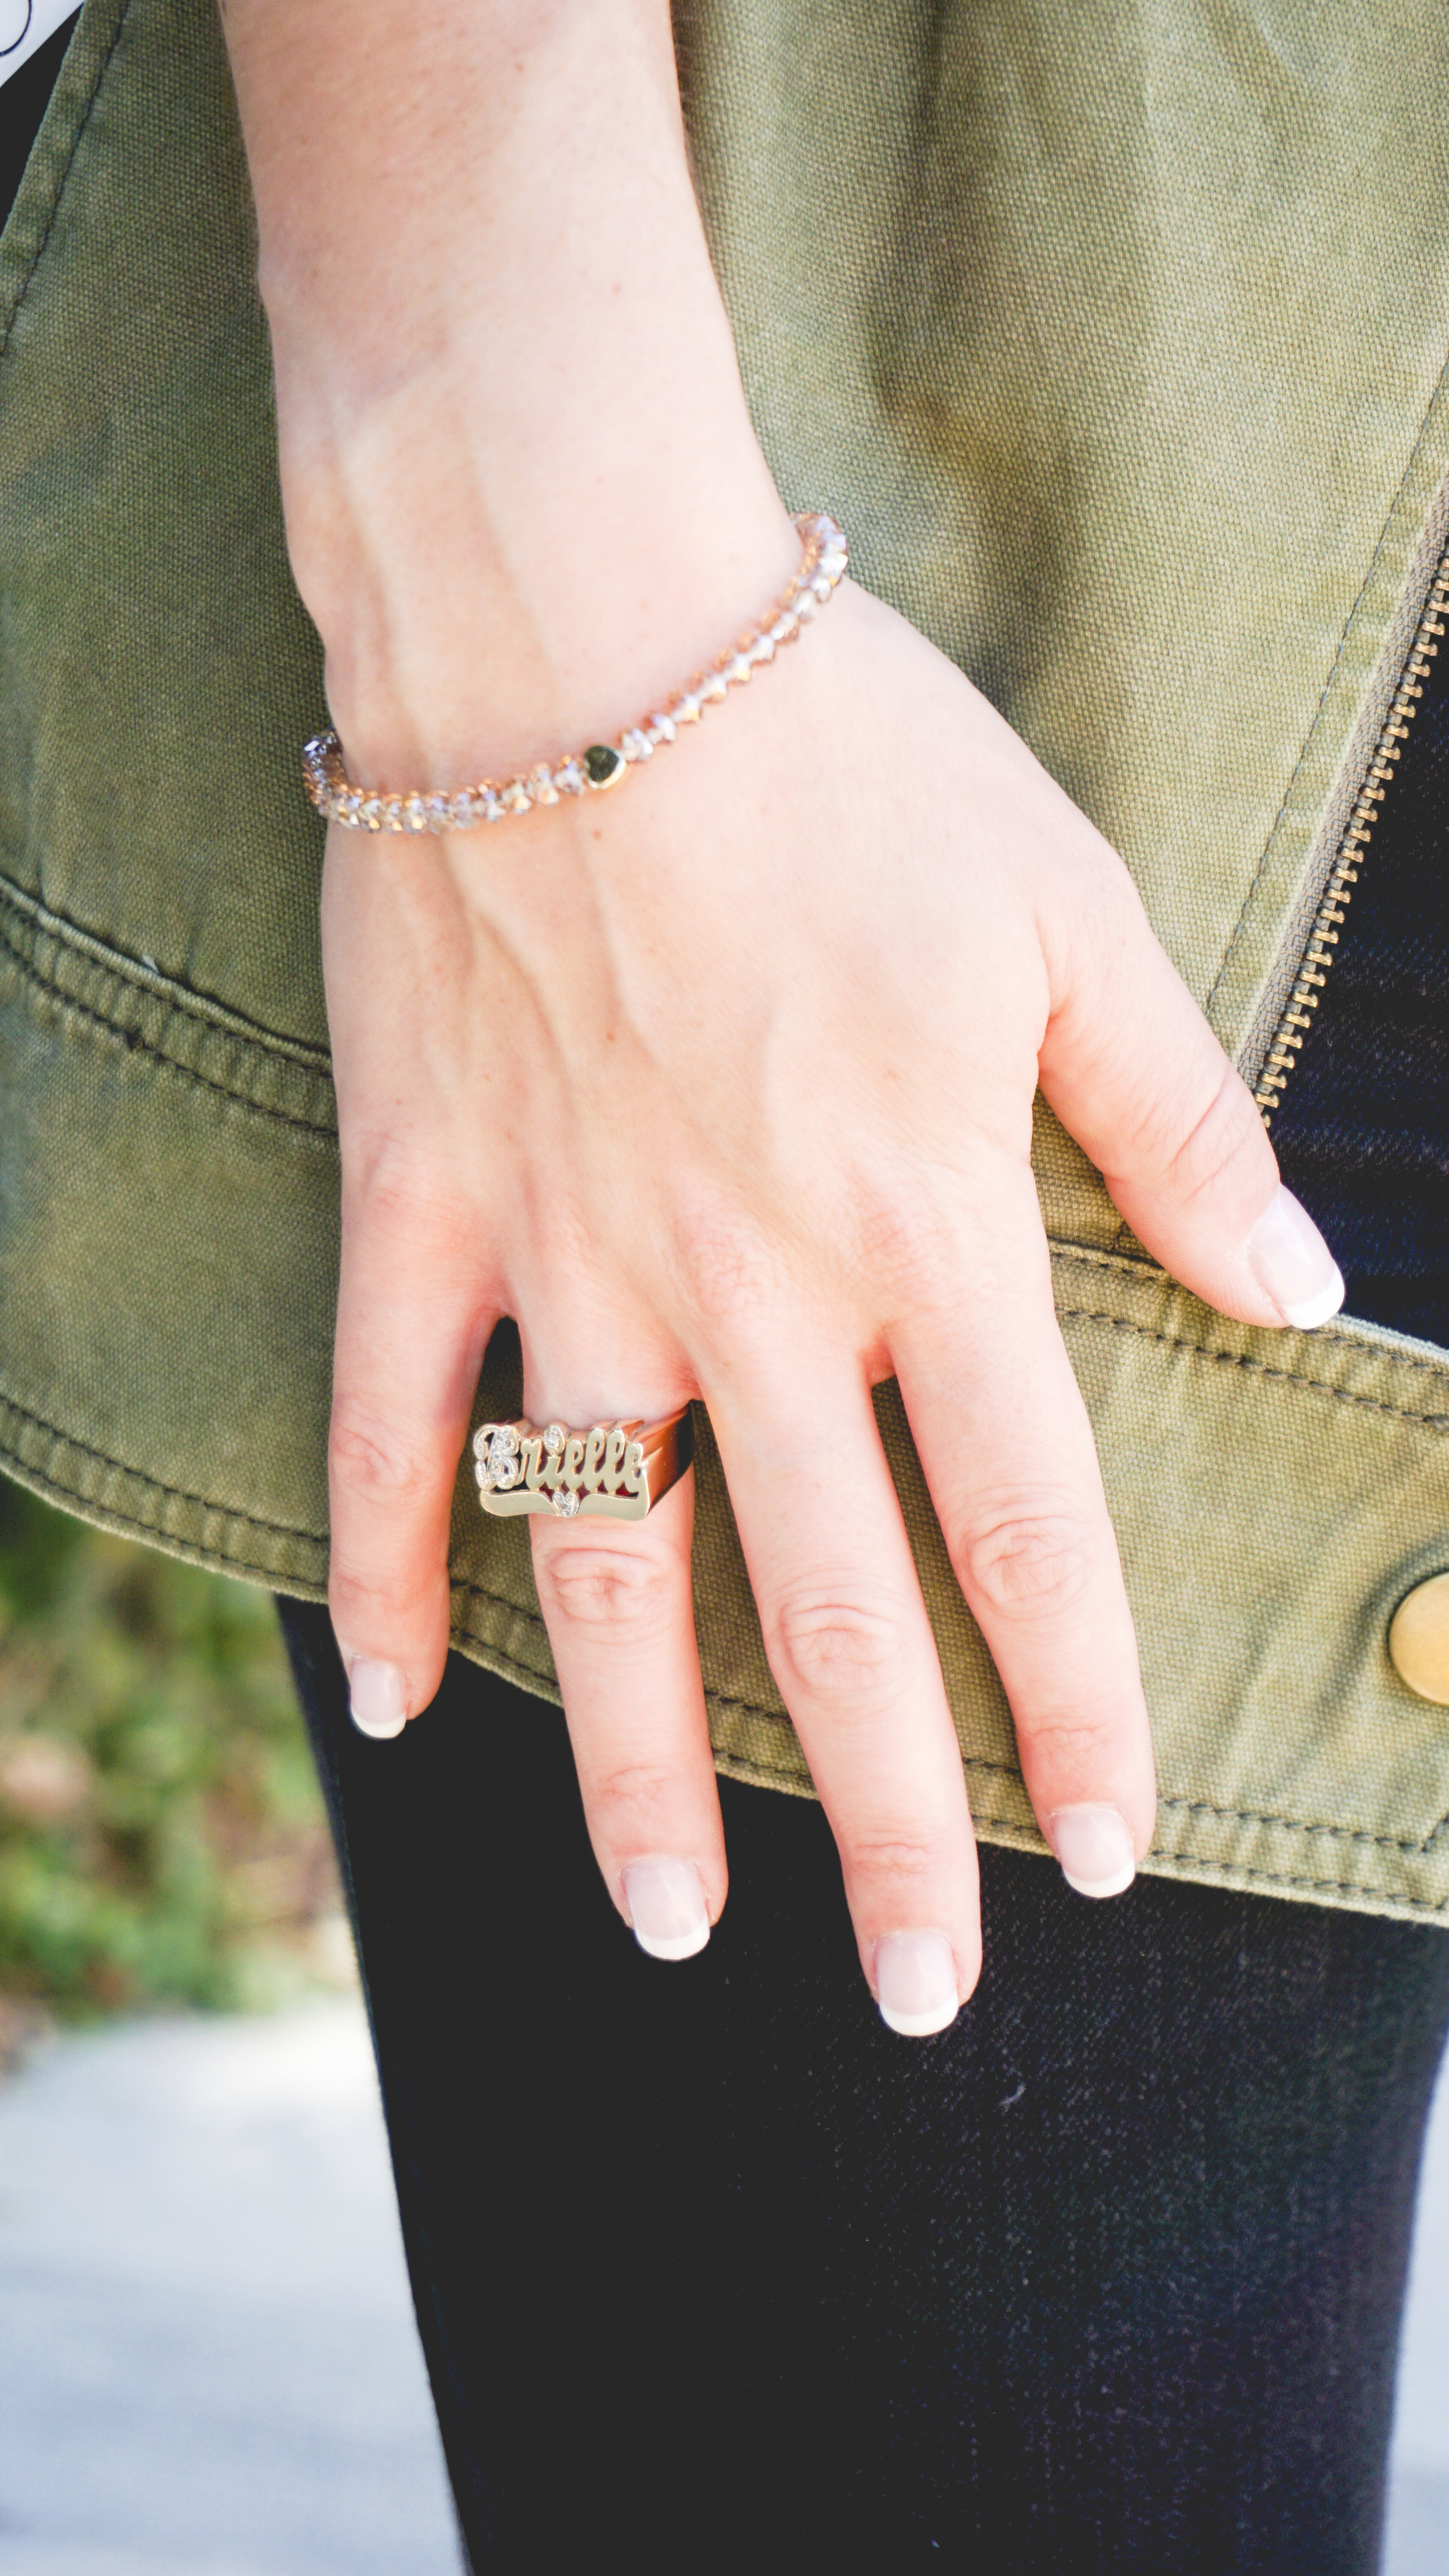 For Keyps Goldtone Bracelet on The Gilded Bellini